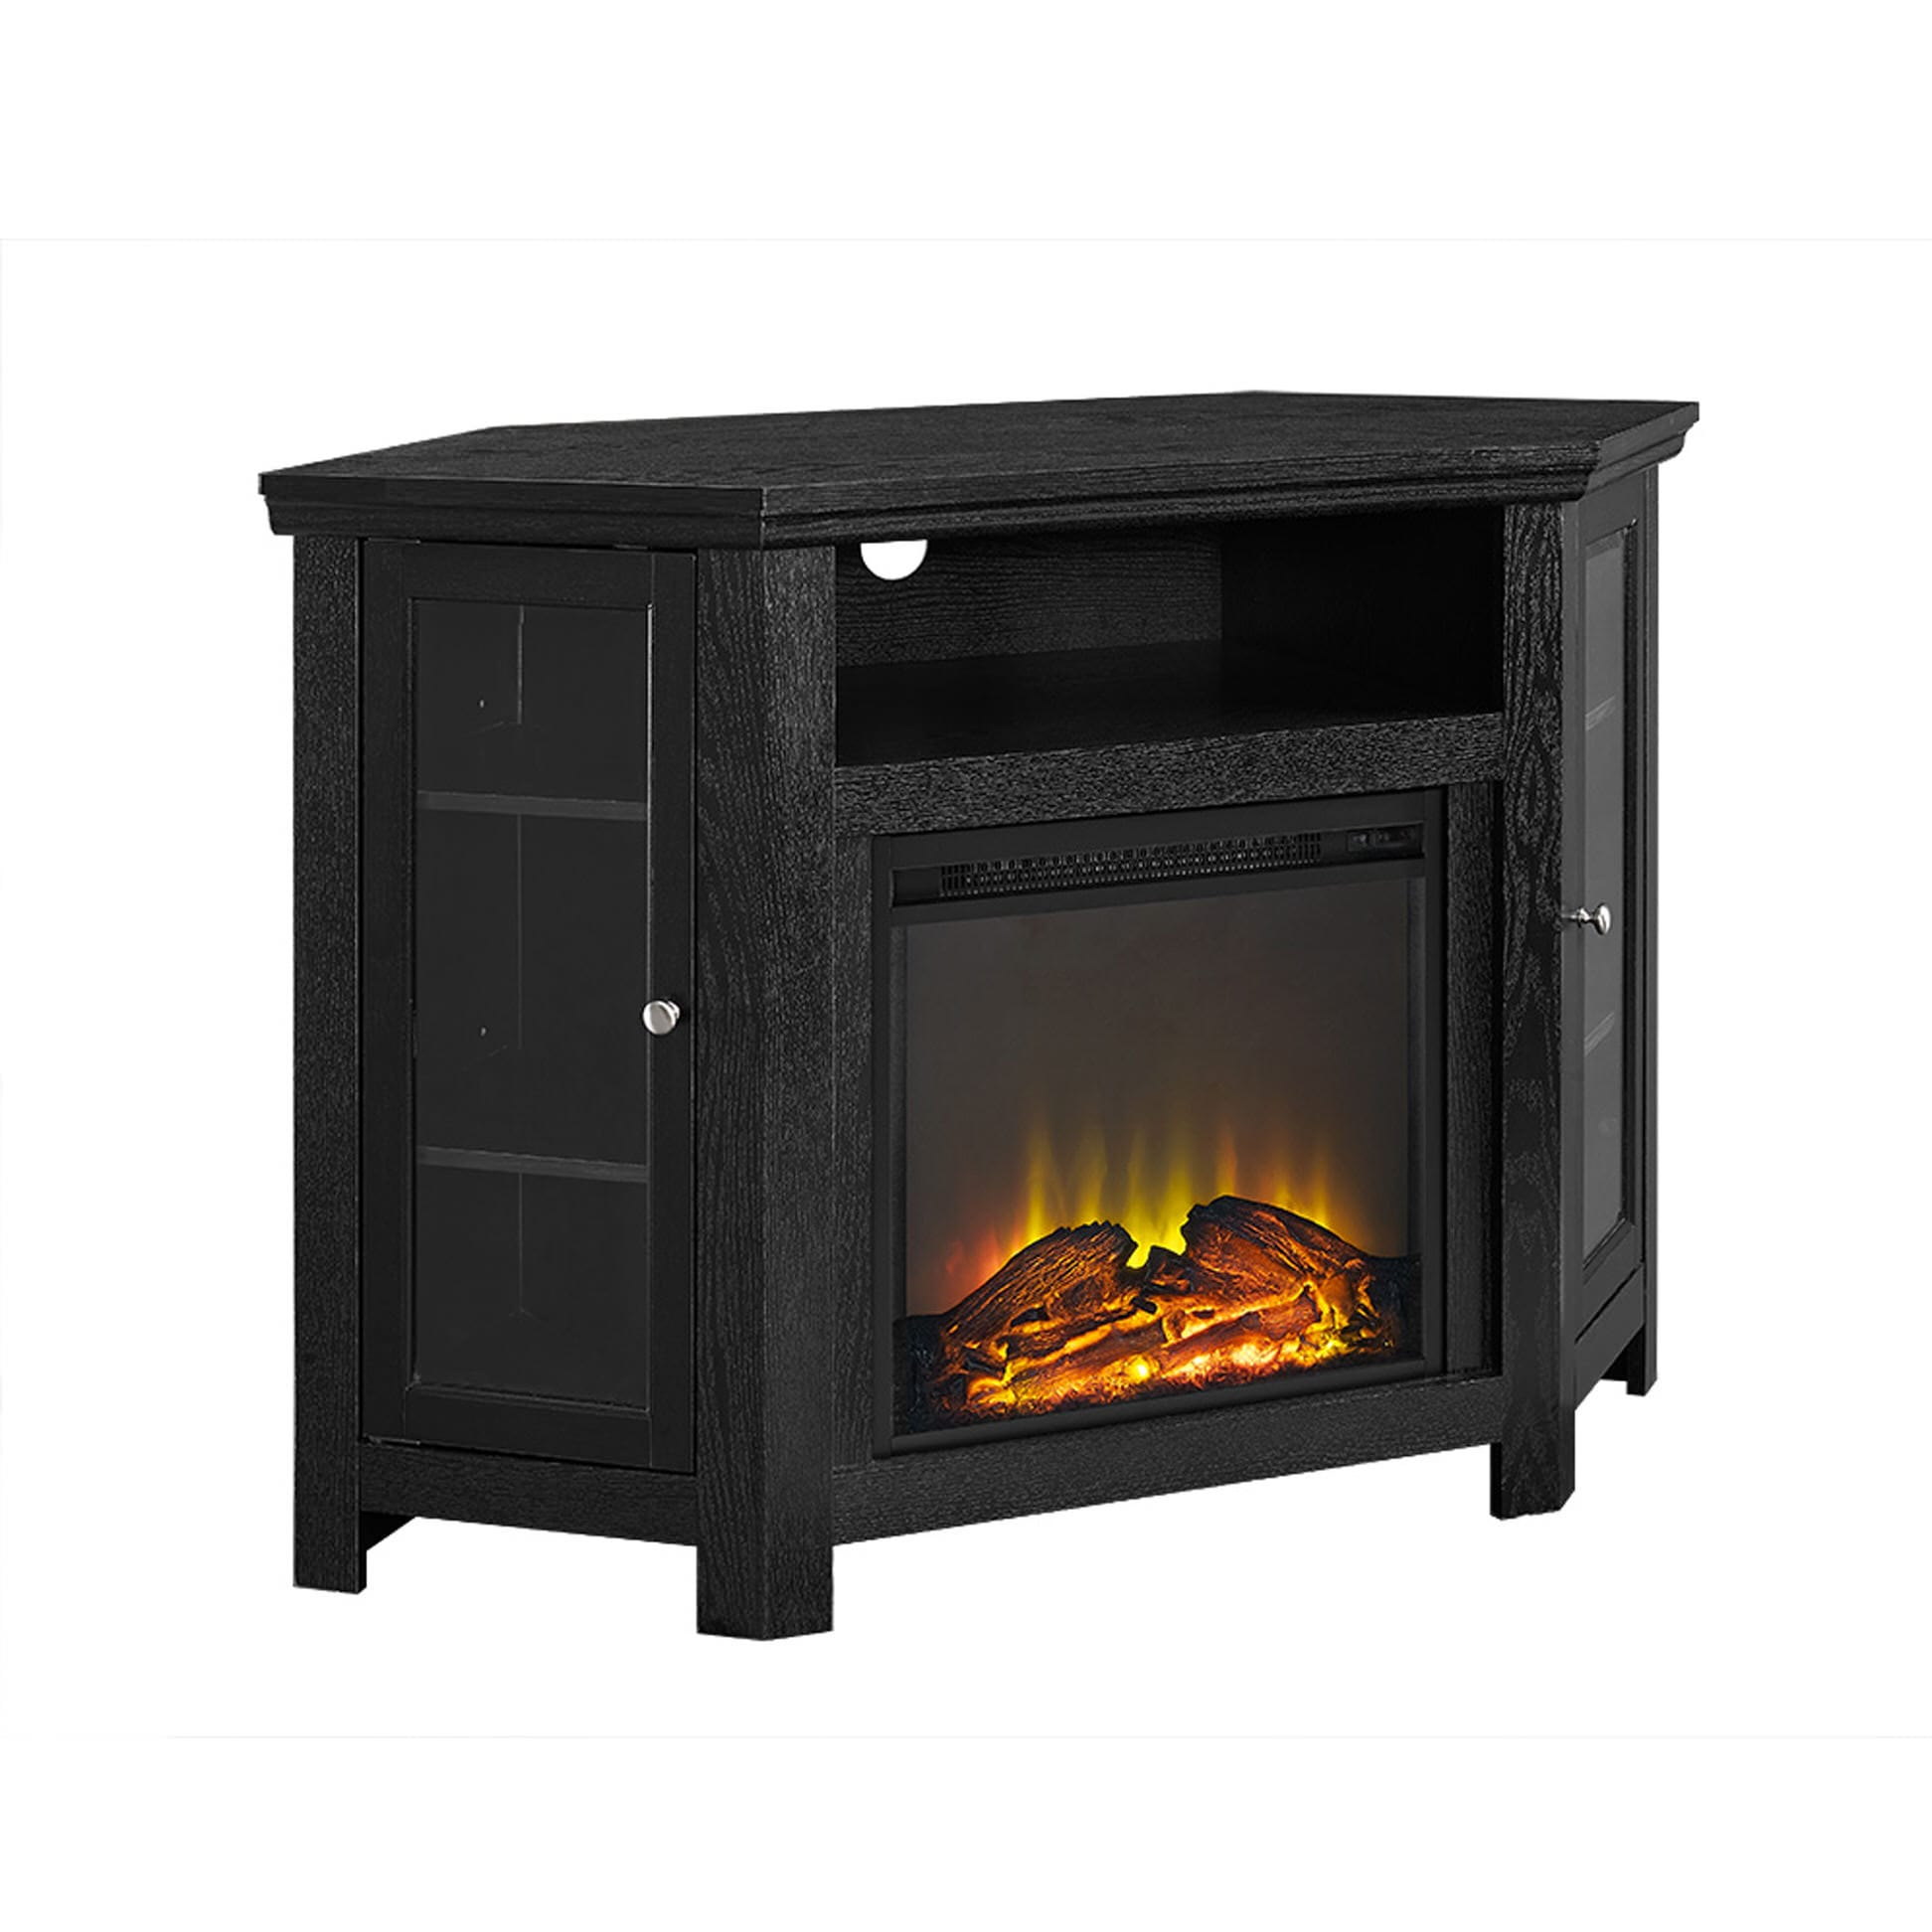 Jackson 48 Inch Corner Fireplace TV Stand